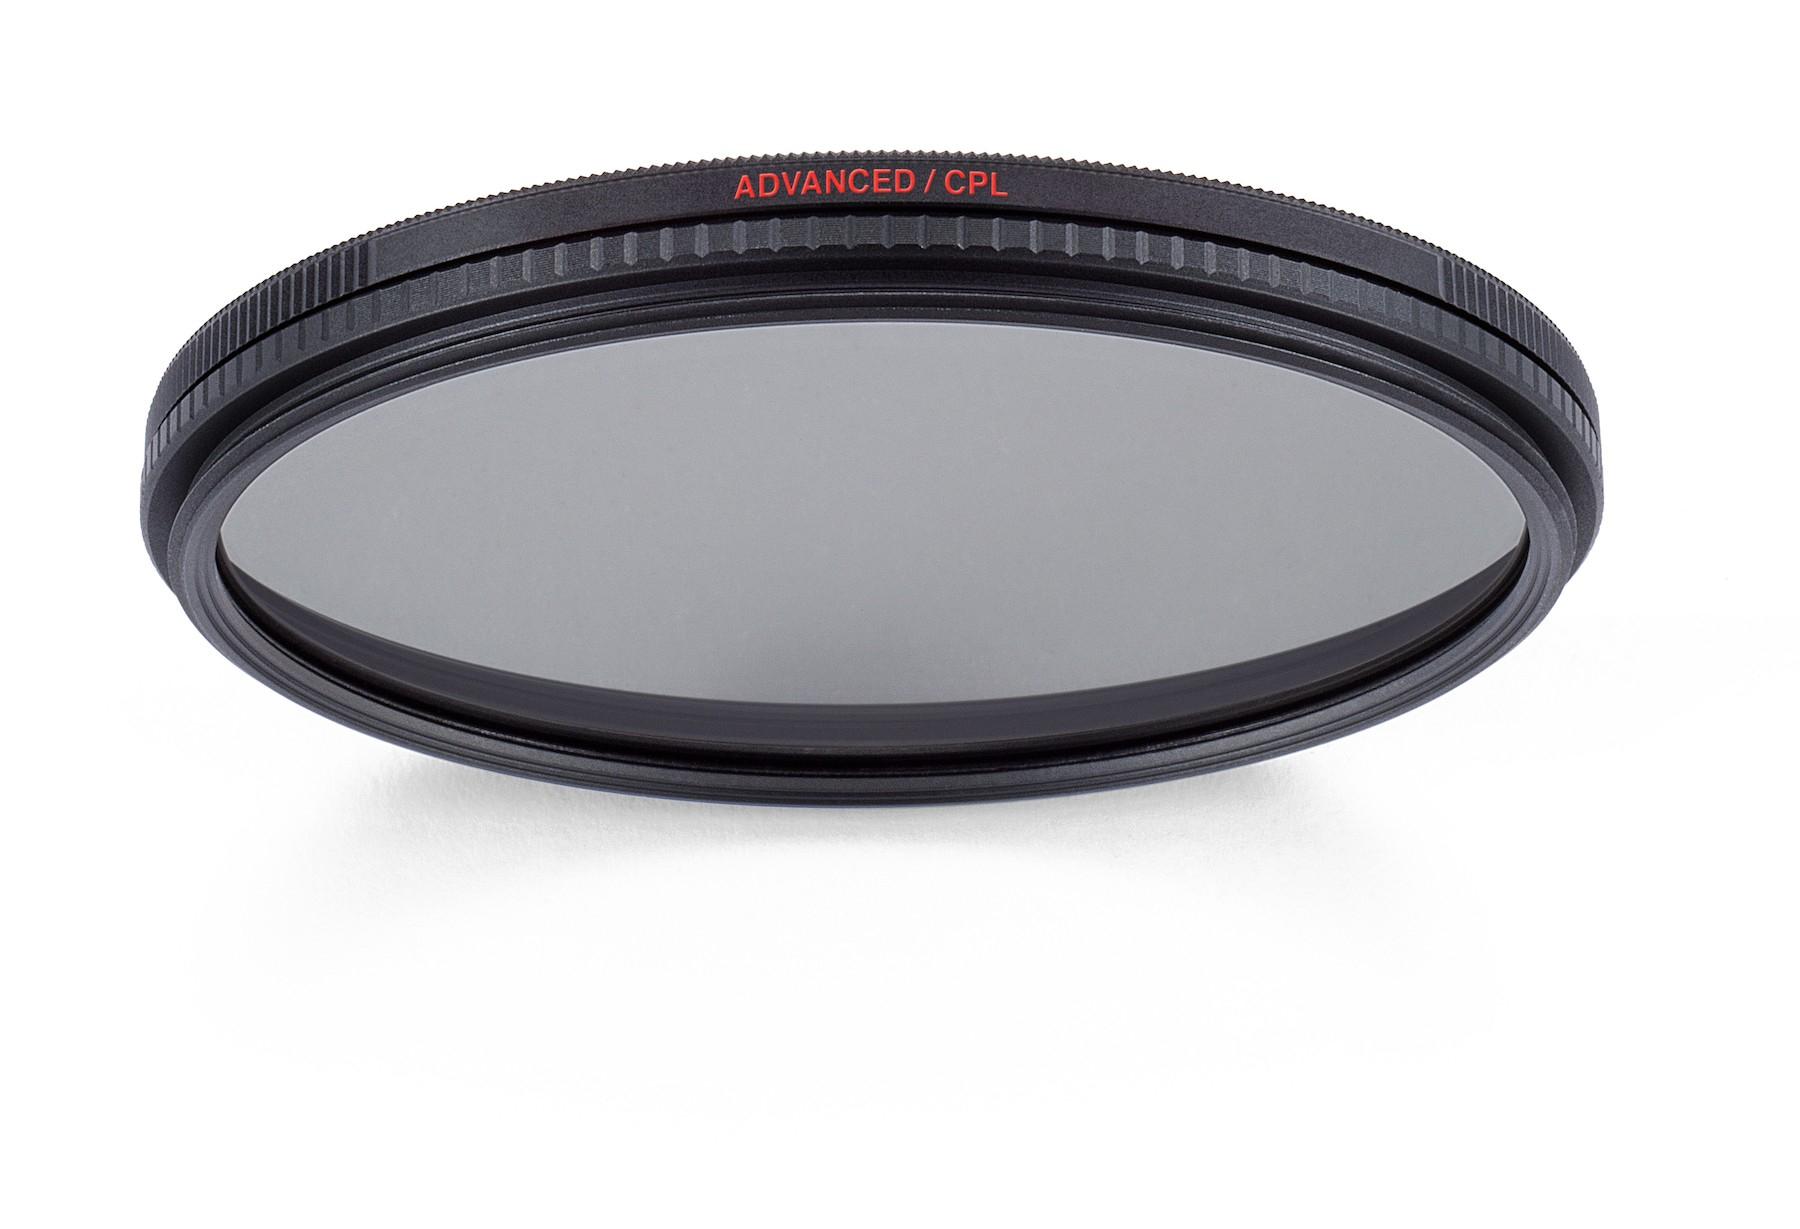 77mm Advanced Circular Polarizing Filter